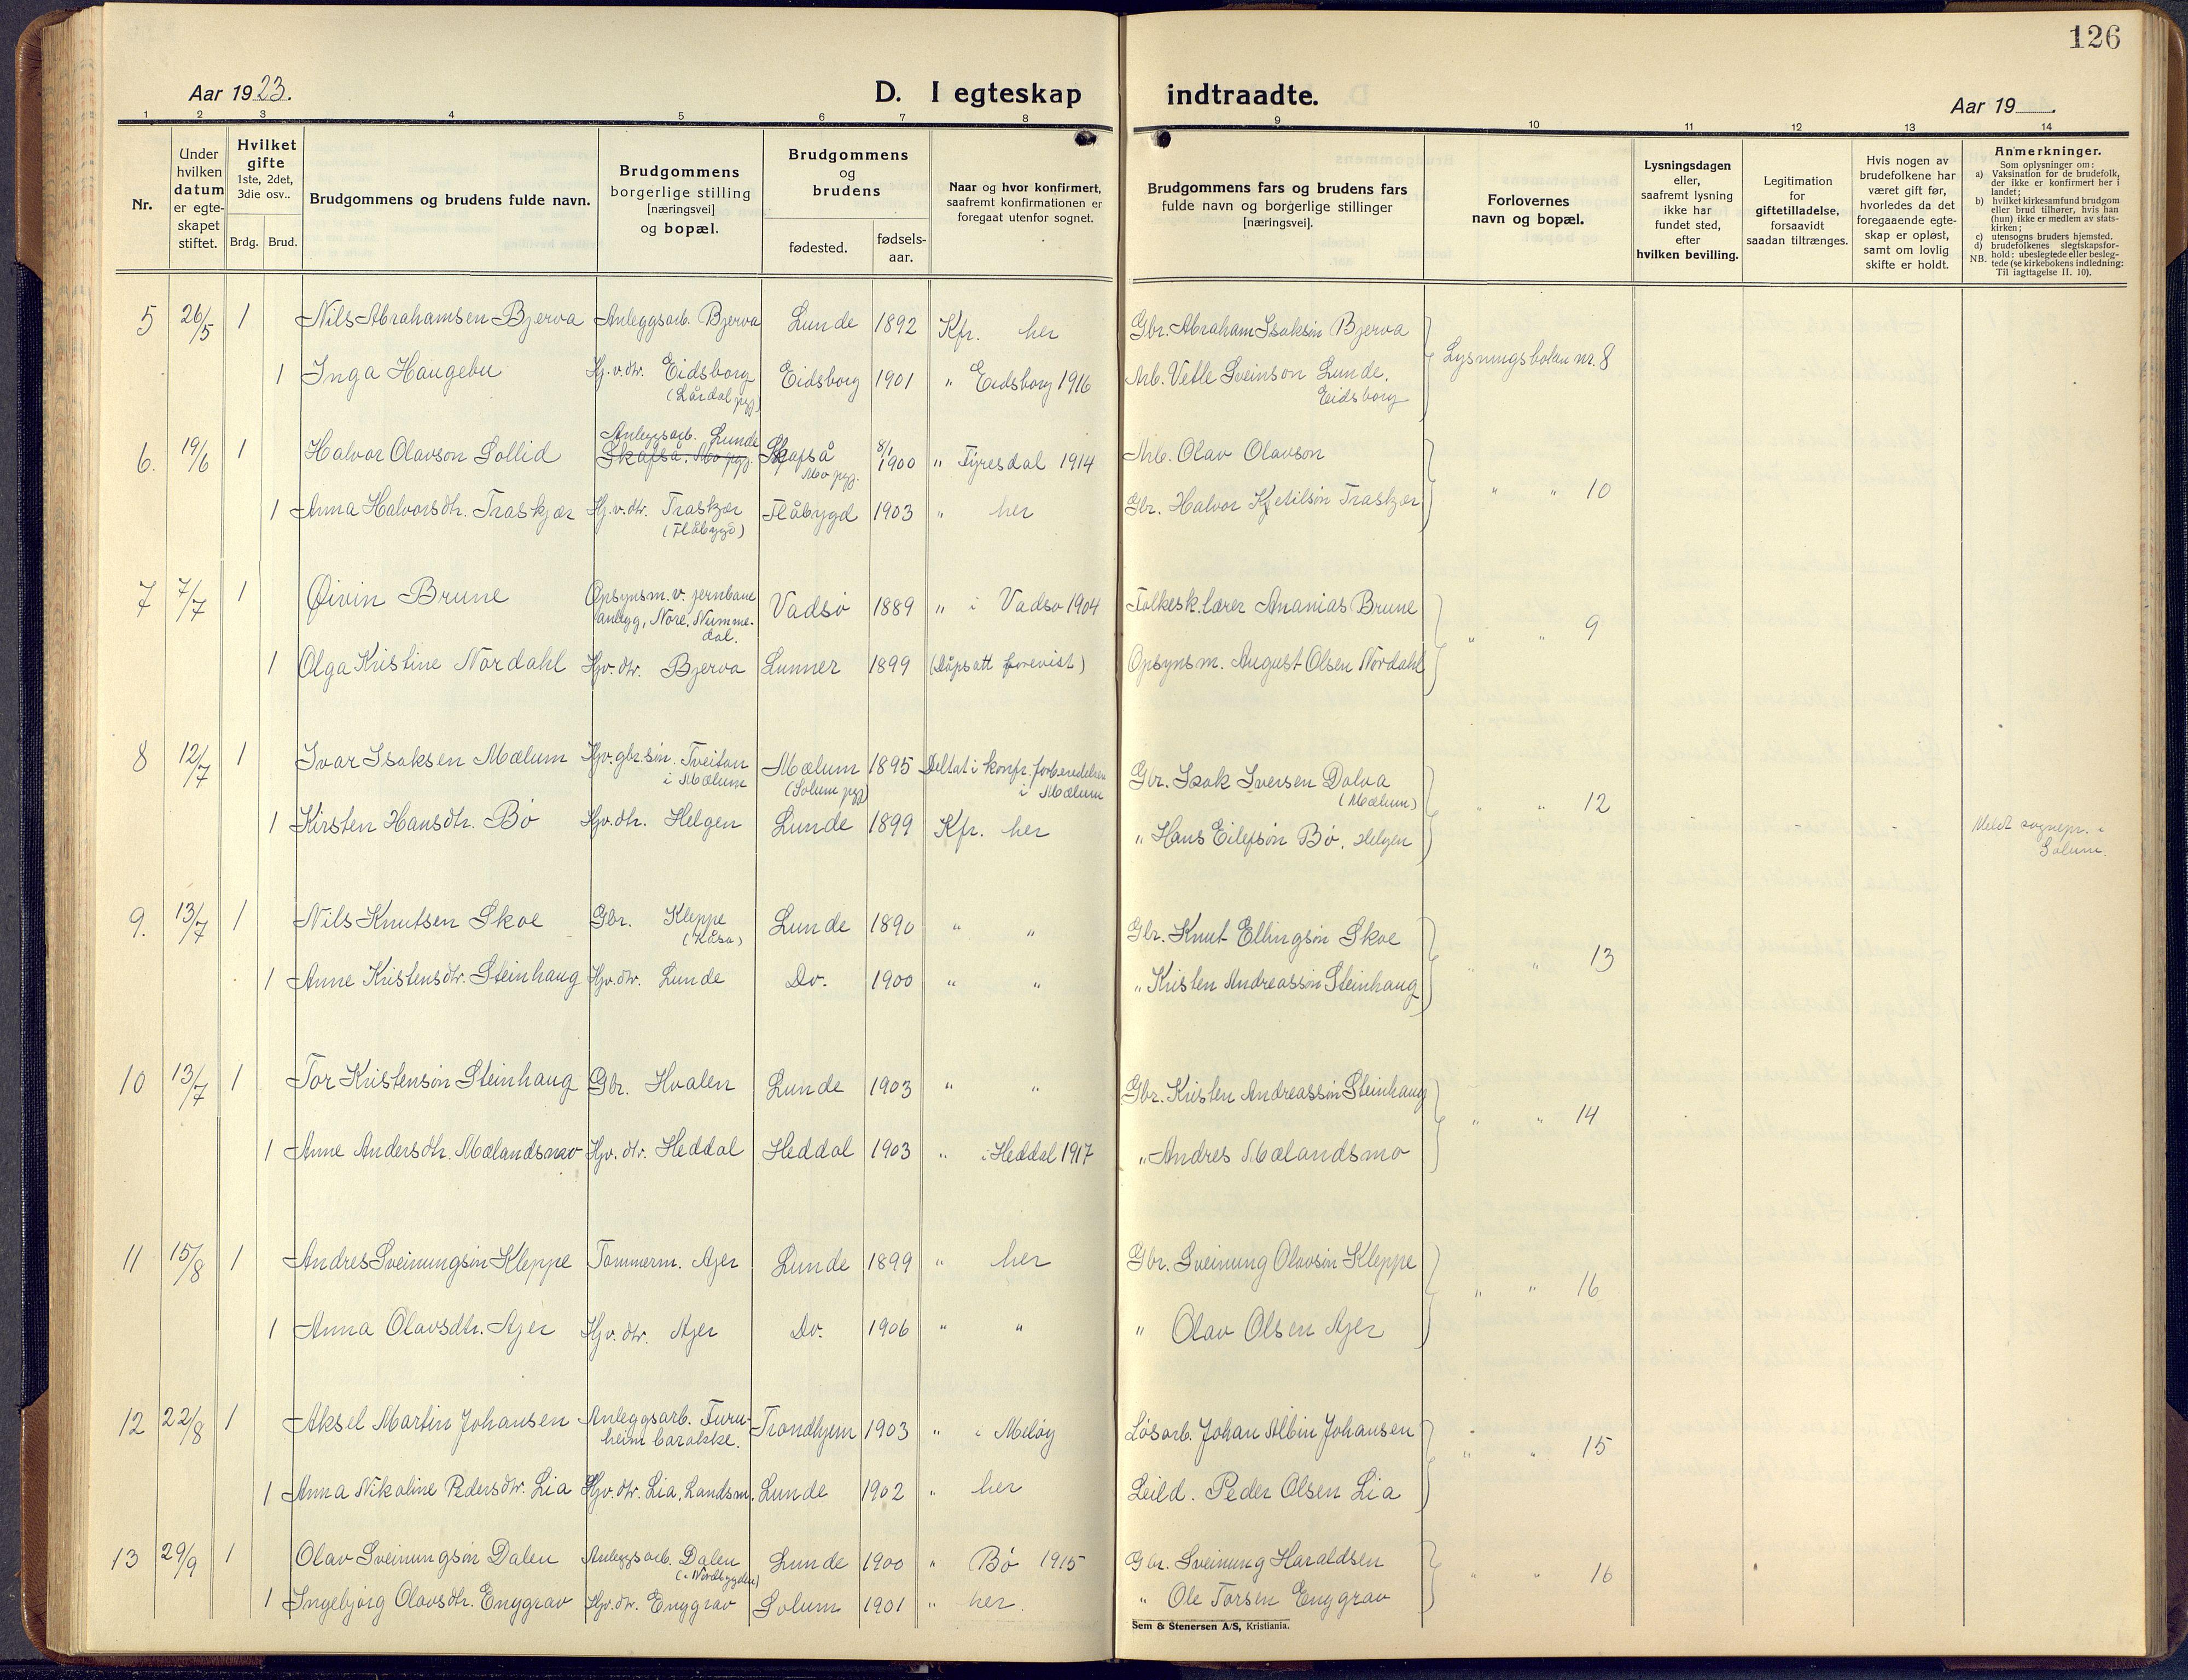 SAKO, Lunde kirkebøker, F/Fa/L0006: Ministerialbok nr. I 6, 1922-1940, s. 126